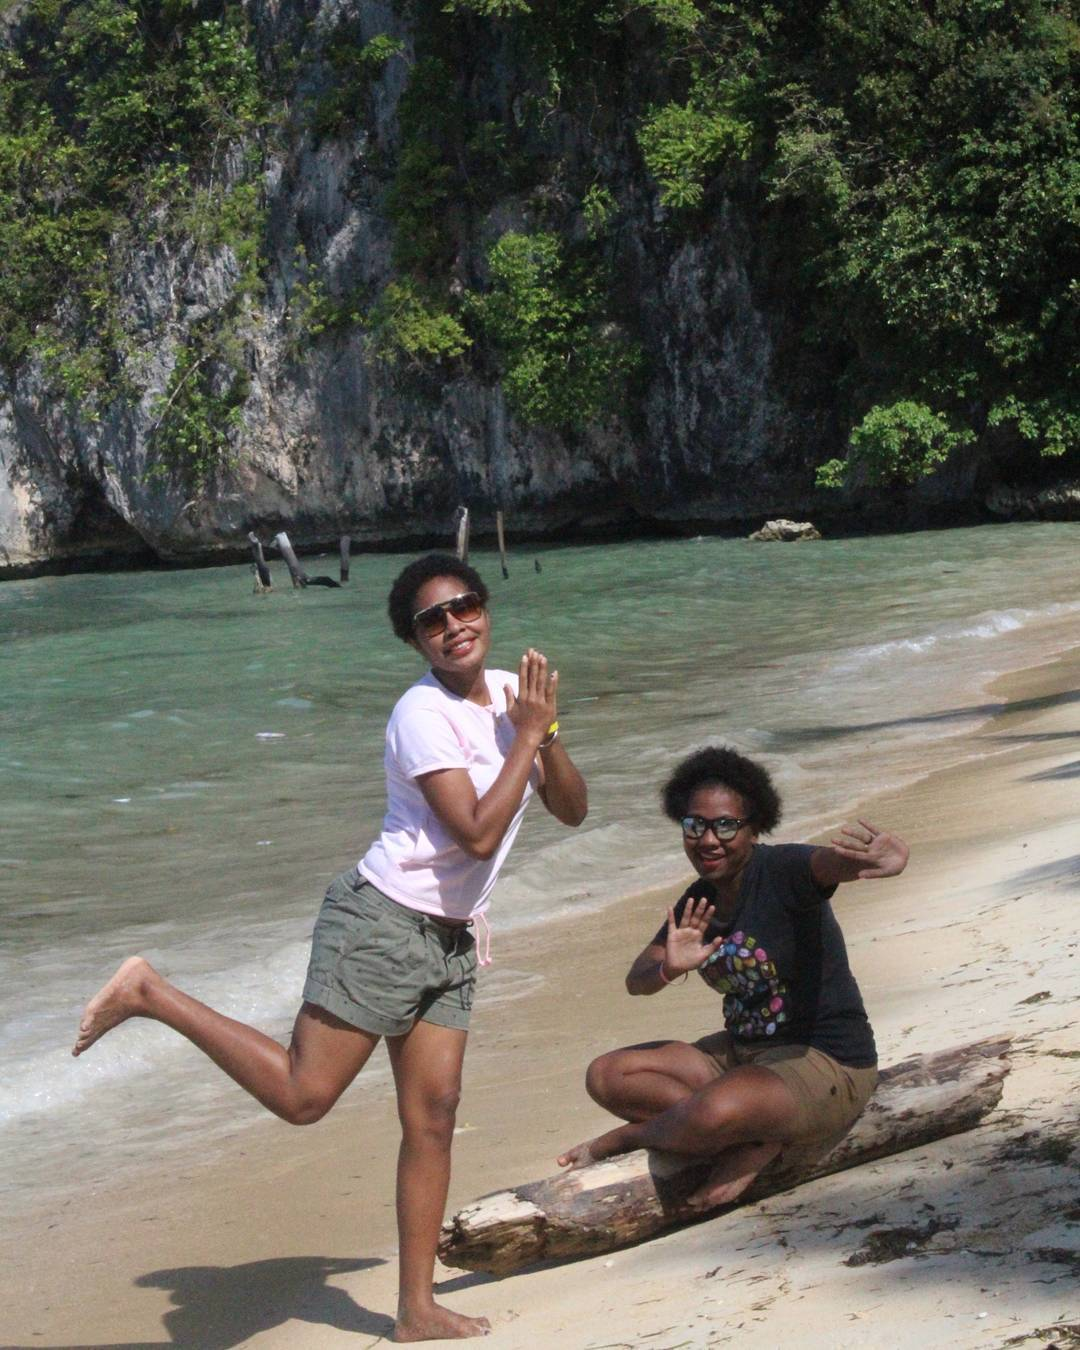 7 Wisata Jayapura Sajikan Panorama Alam Tanah Papua Menikmati Pantai